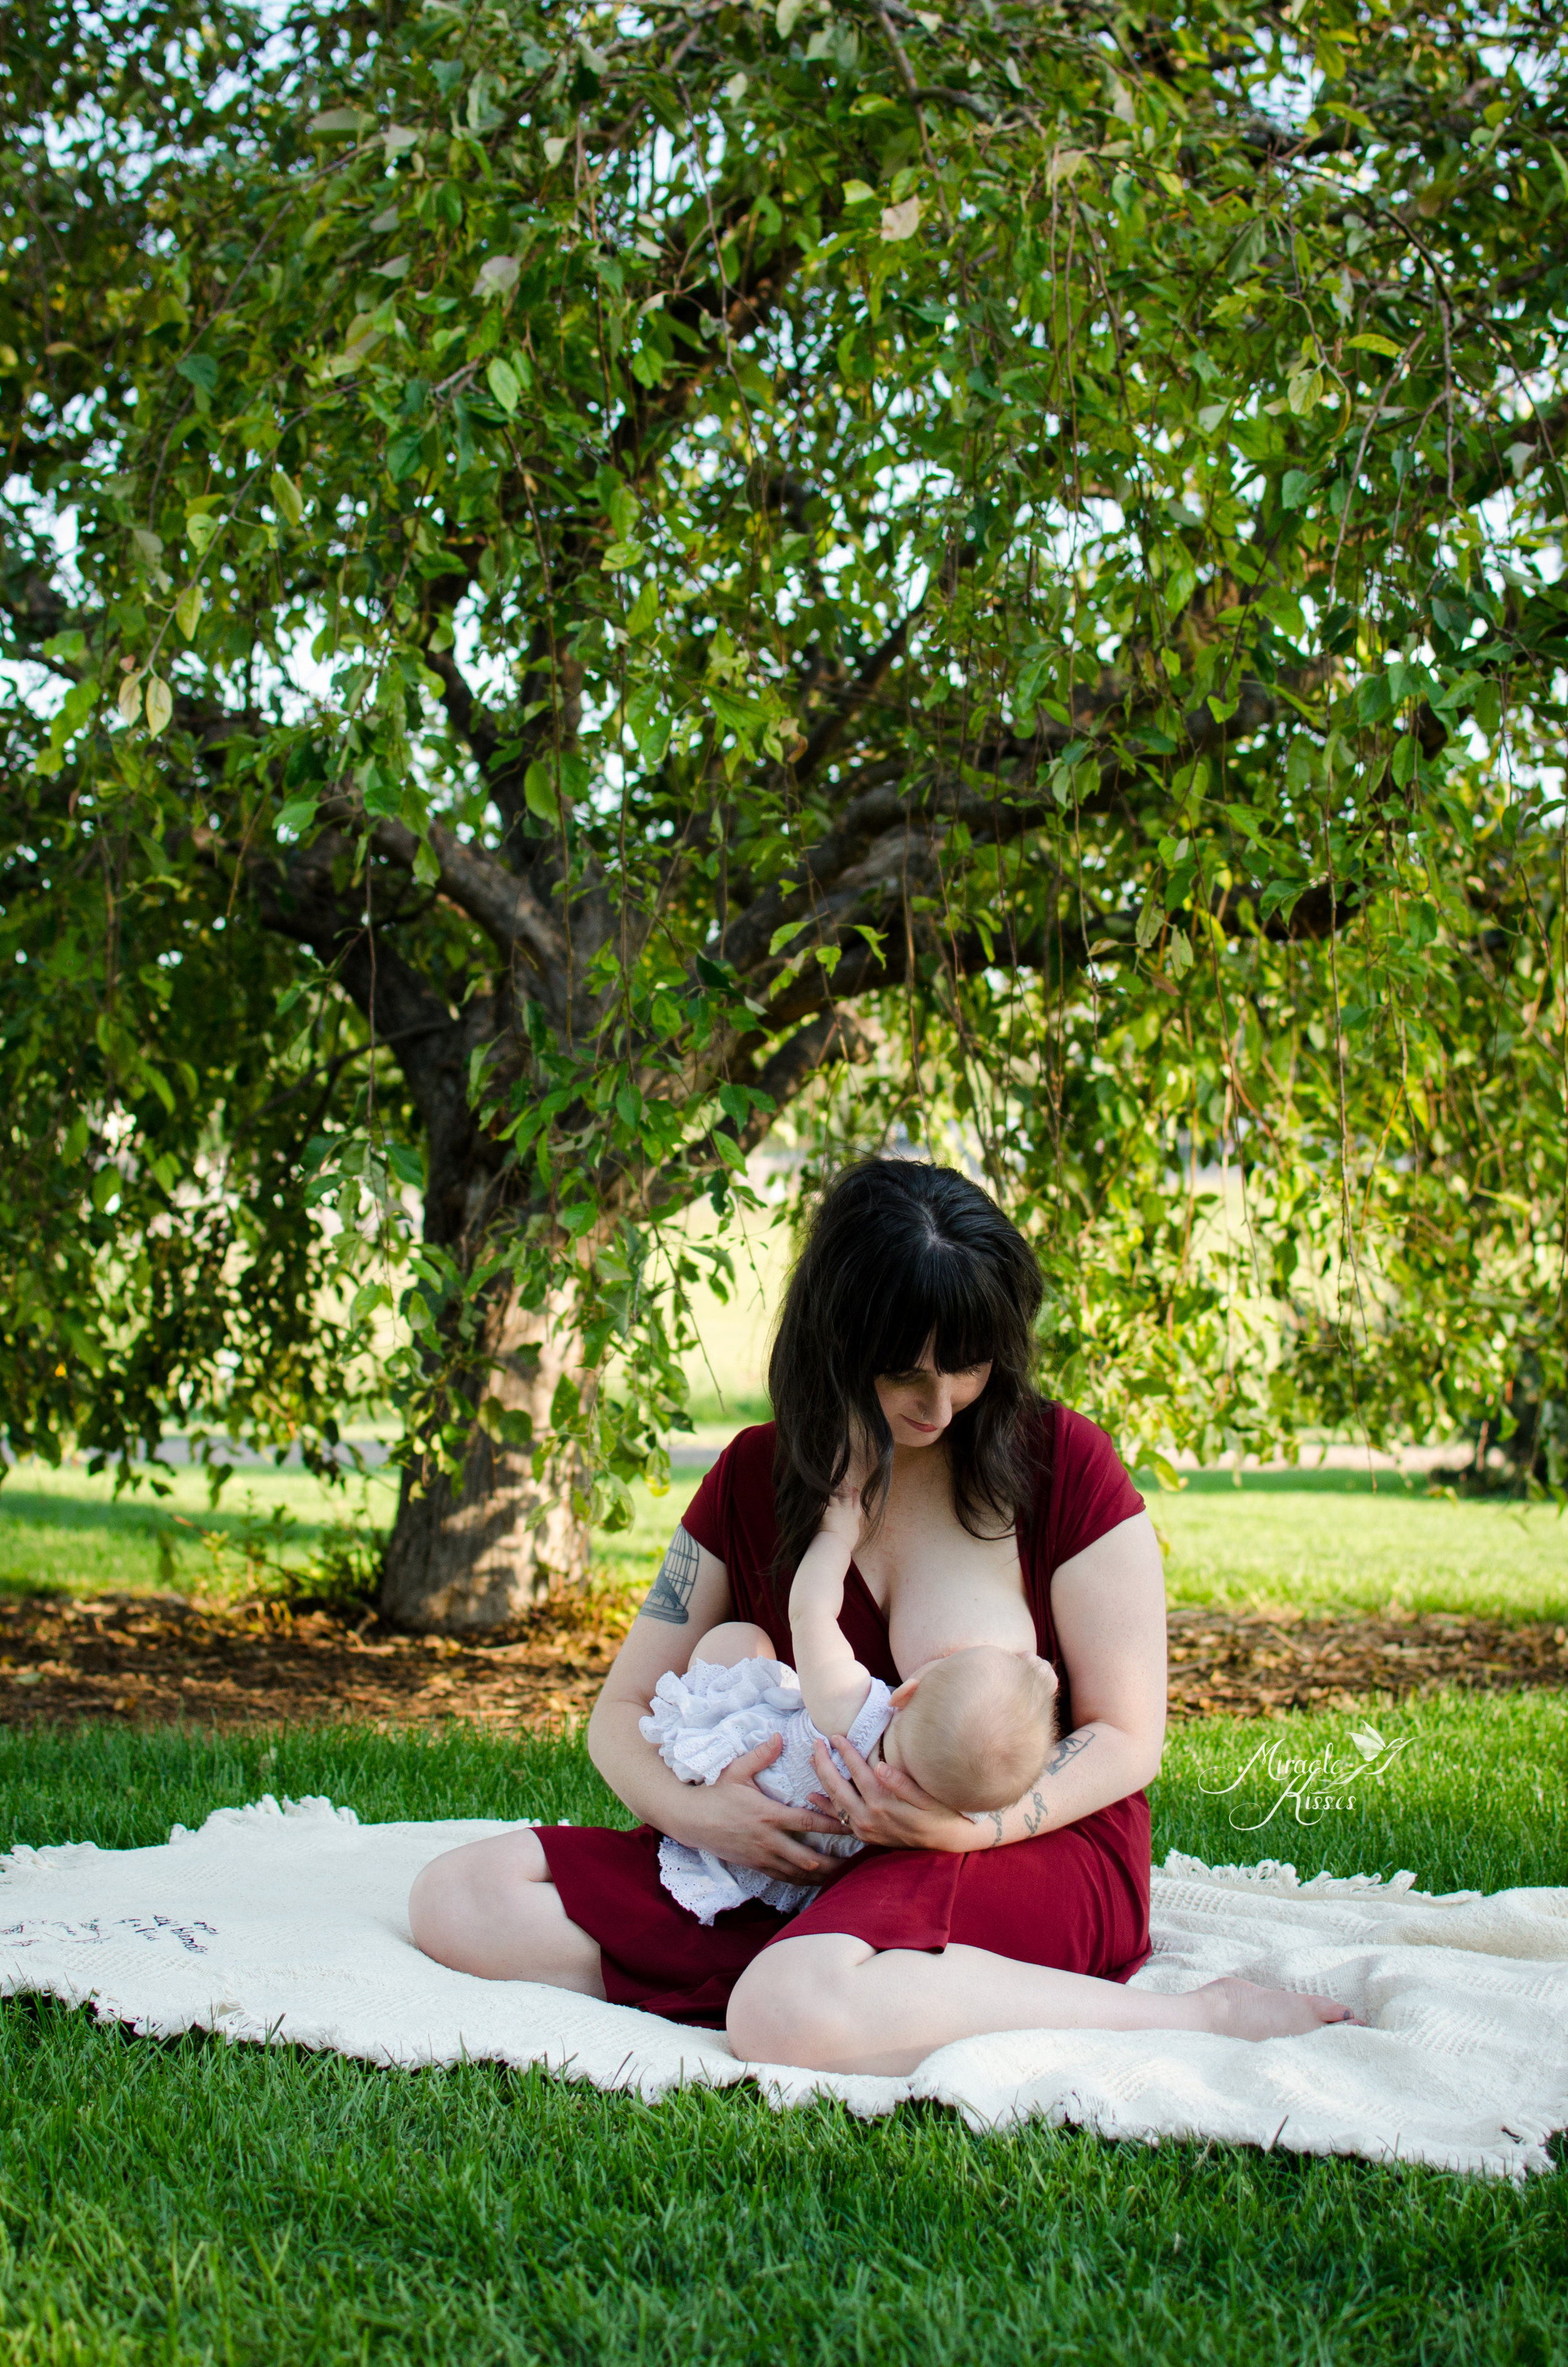 breastfeeding in public, 31 days 31 stories, lakewood breastfeeding photographer